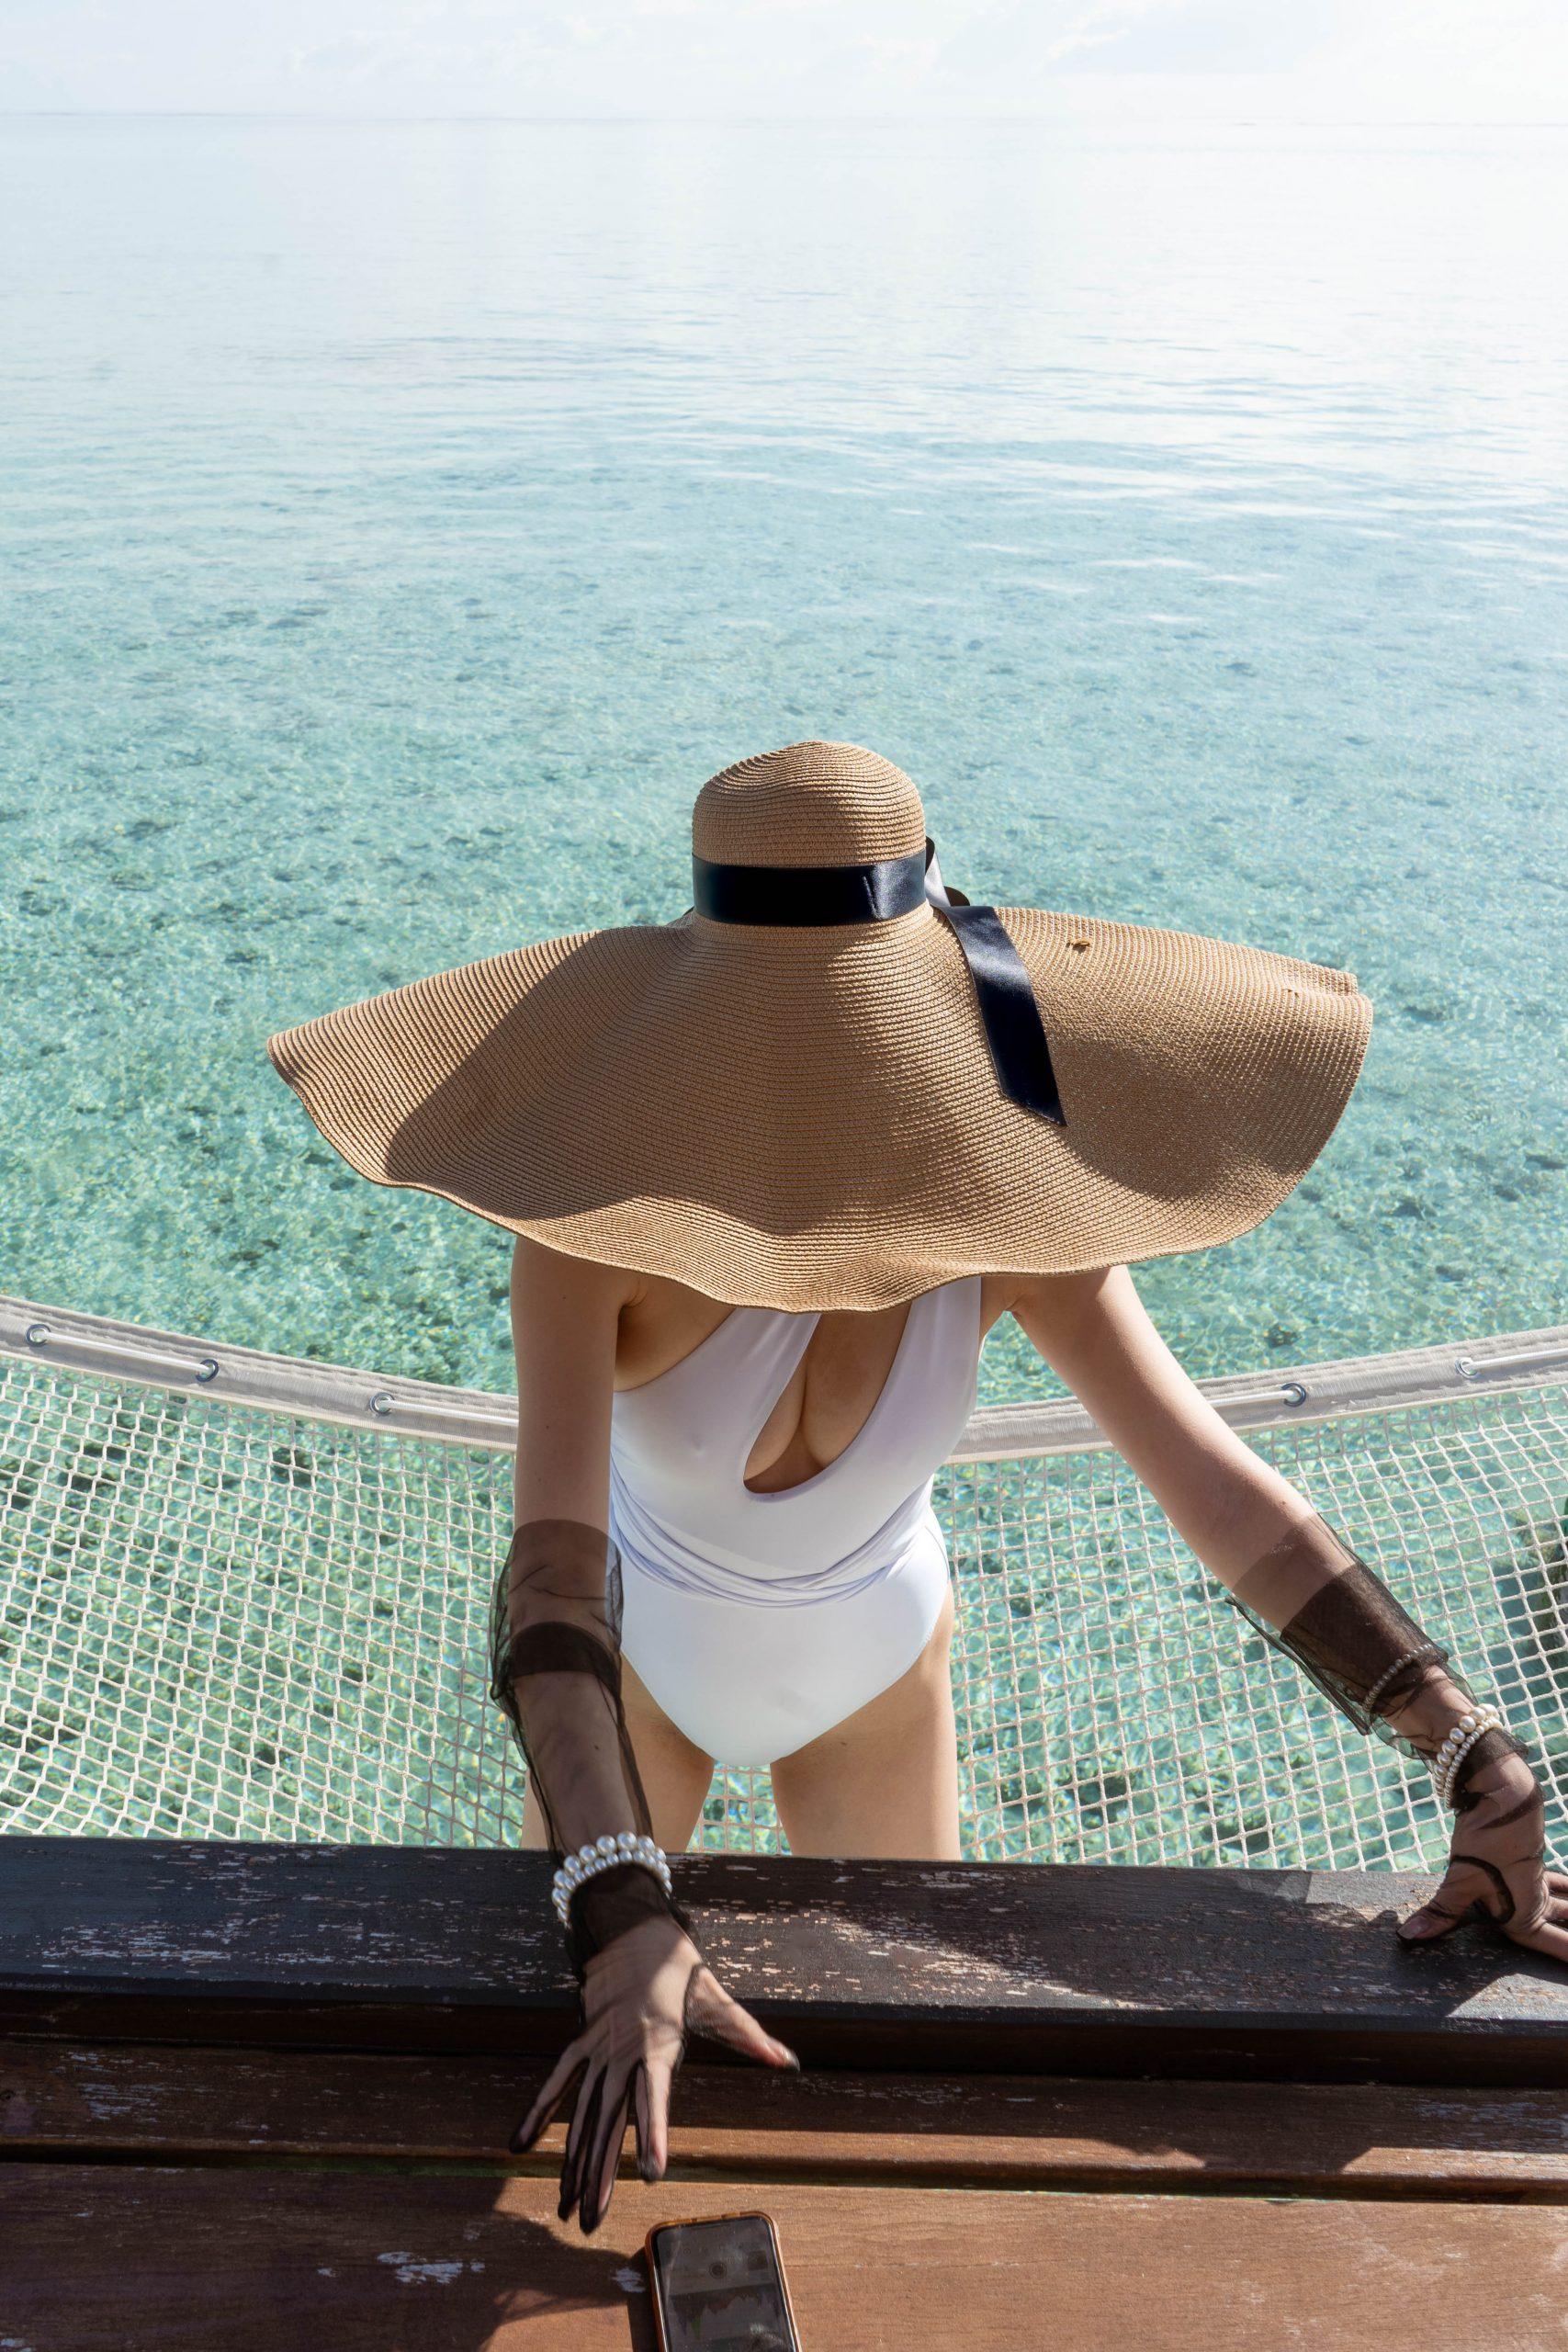 oversized straw sun hat floppy black ribbon inexpensive white one piece swimsuit one shoulder cutout black tulle mesh glove pearl bracelet maldives indian ocean hammock net